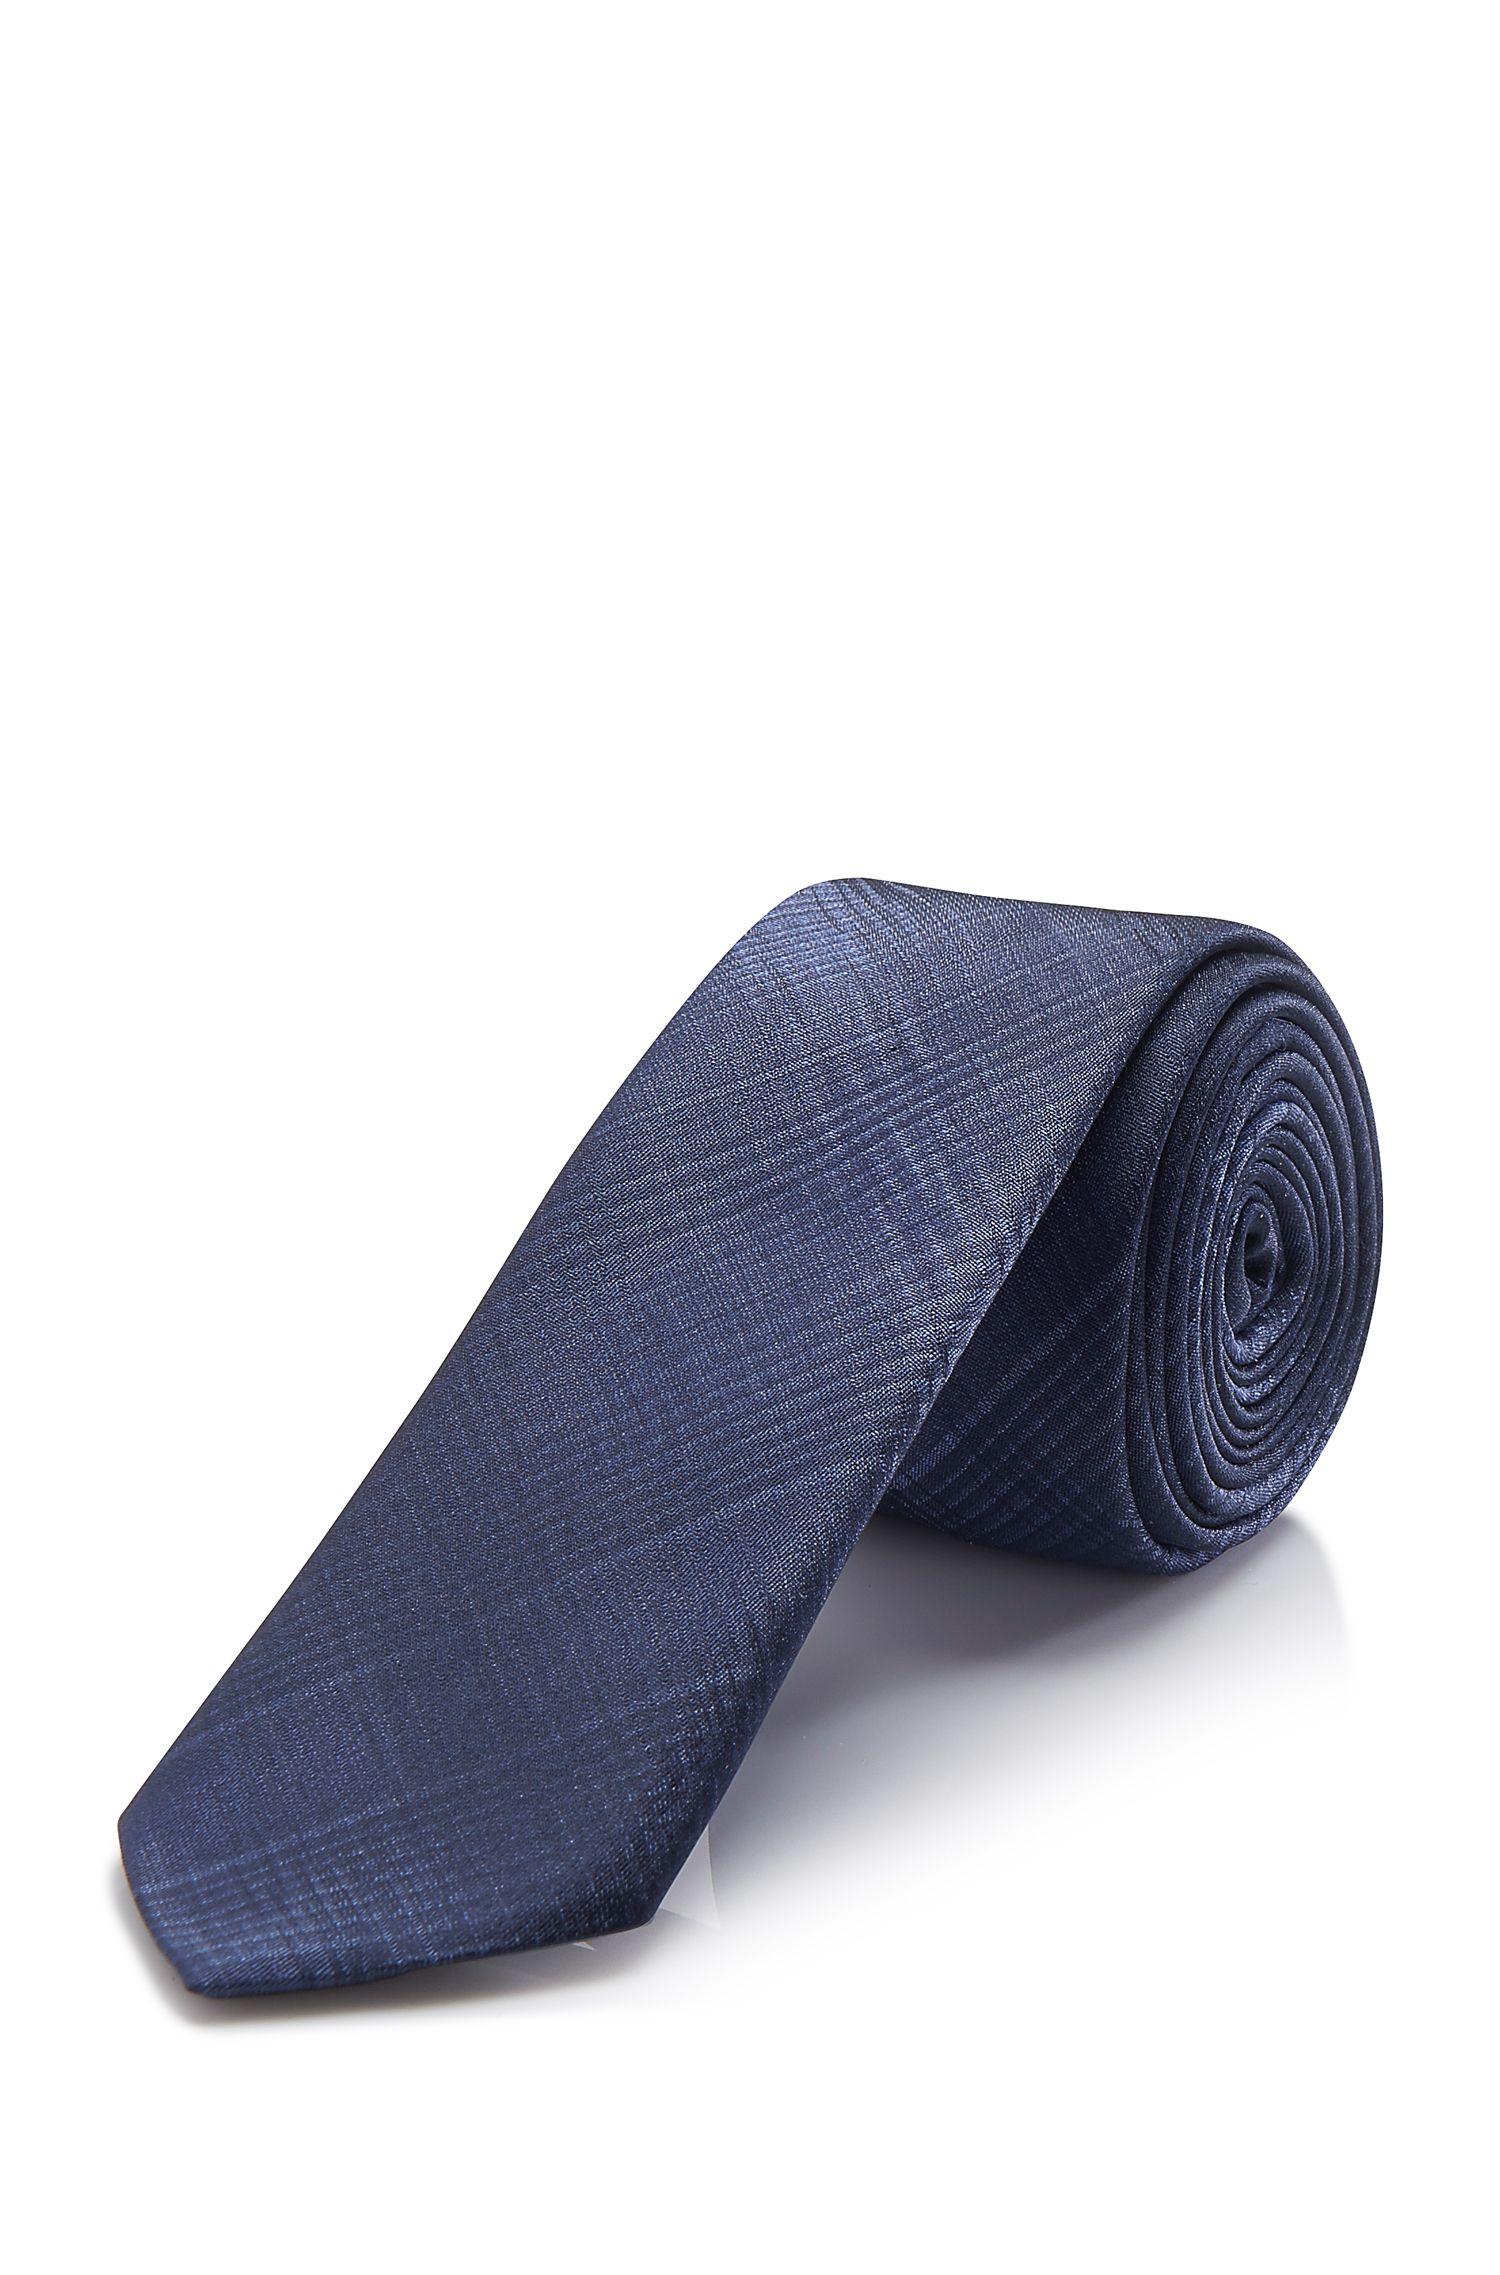 'Tie 4.5 cm'   Skinny, Silk Ombre Tie